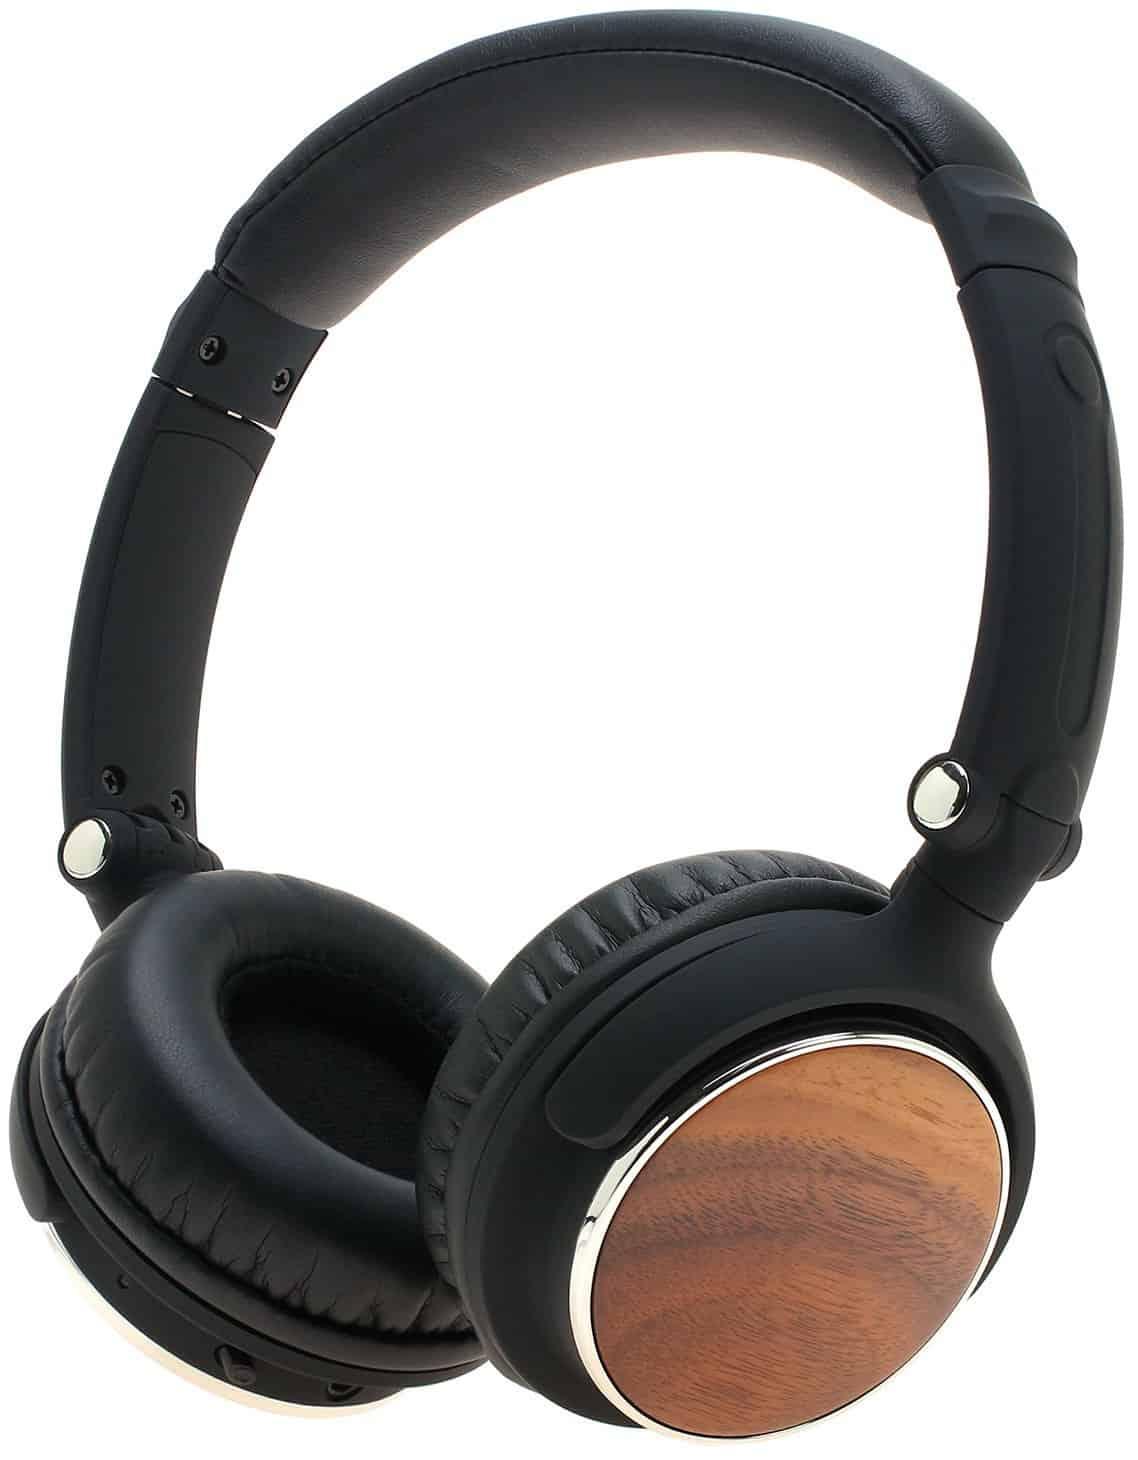 Symphonized Sensation Wireless Headphones